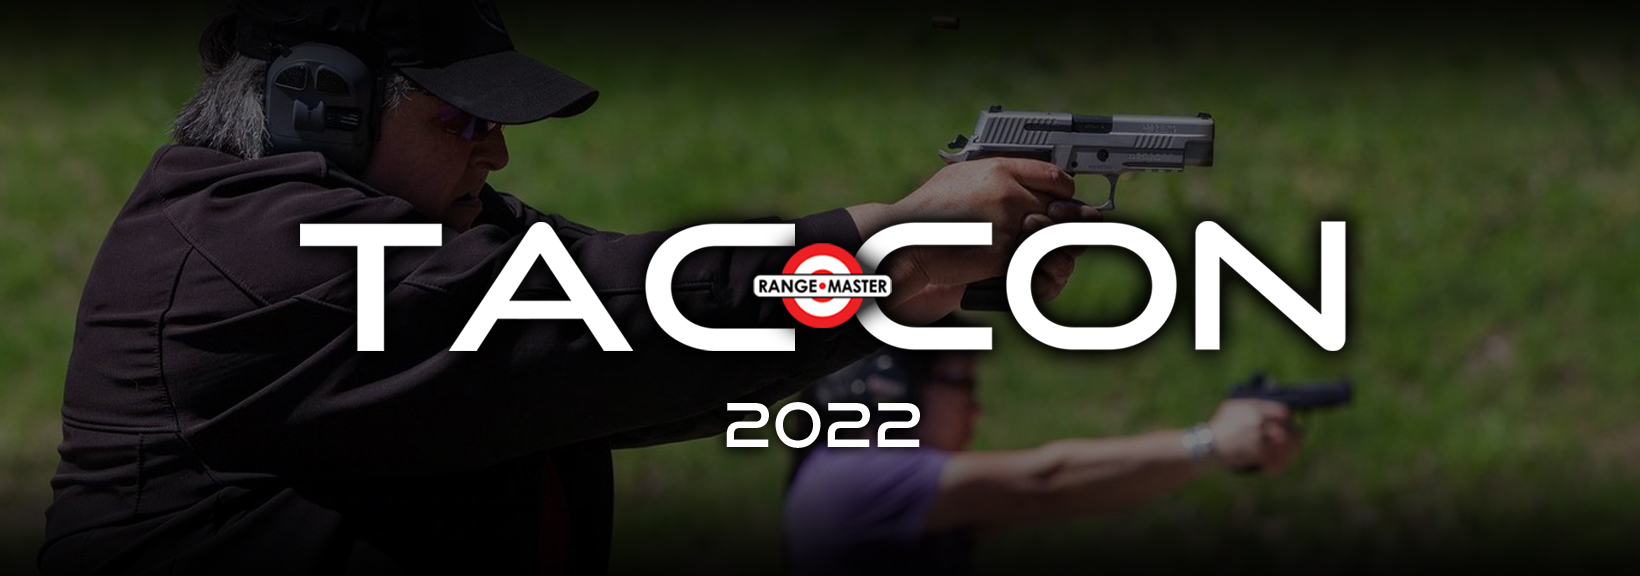 Tac-Con-22